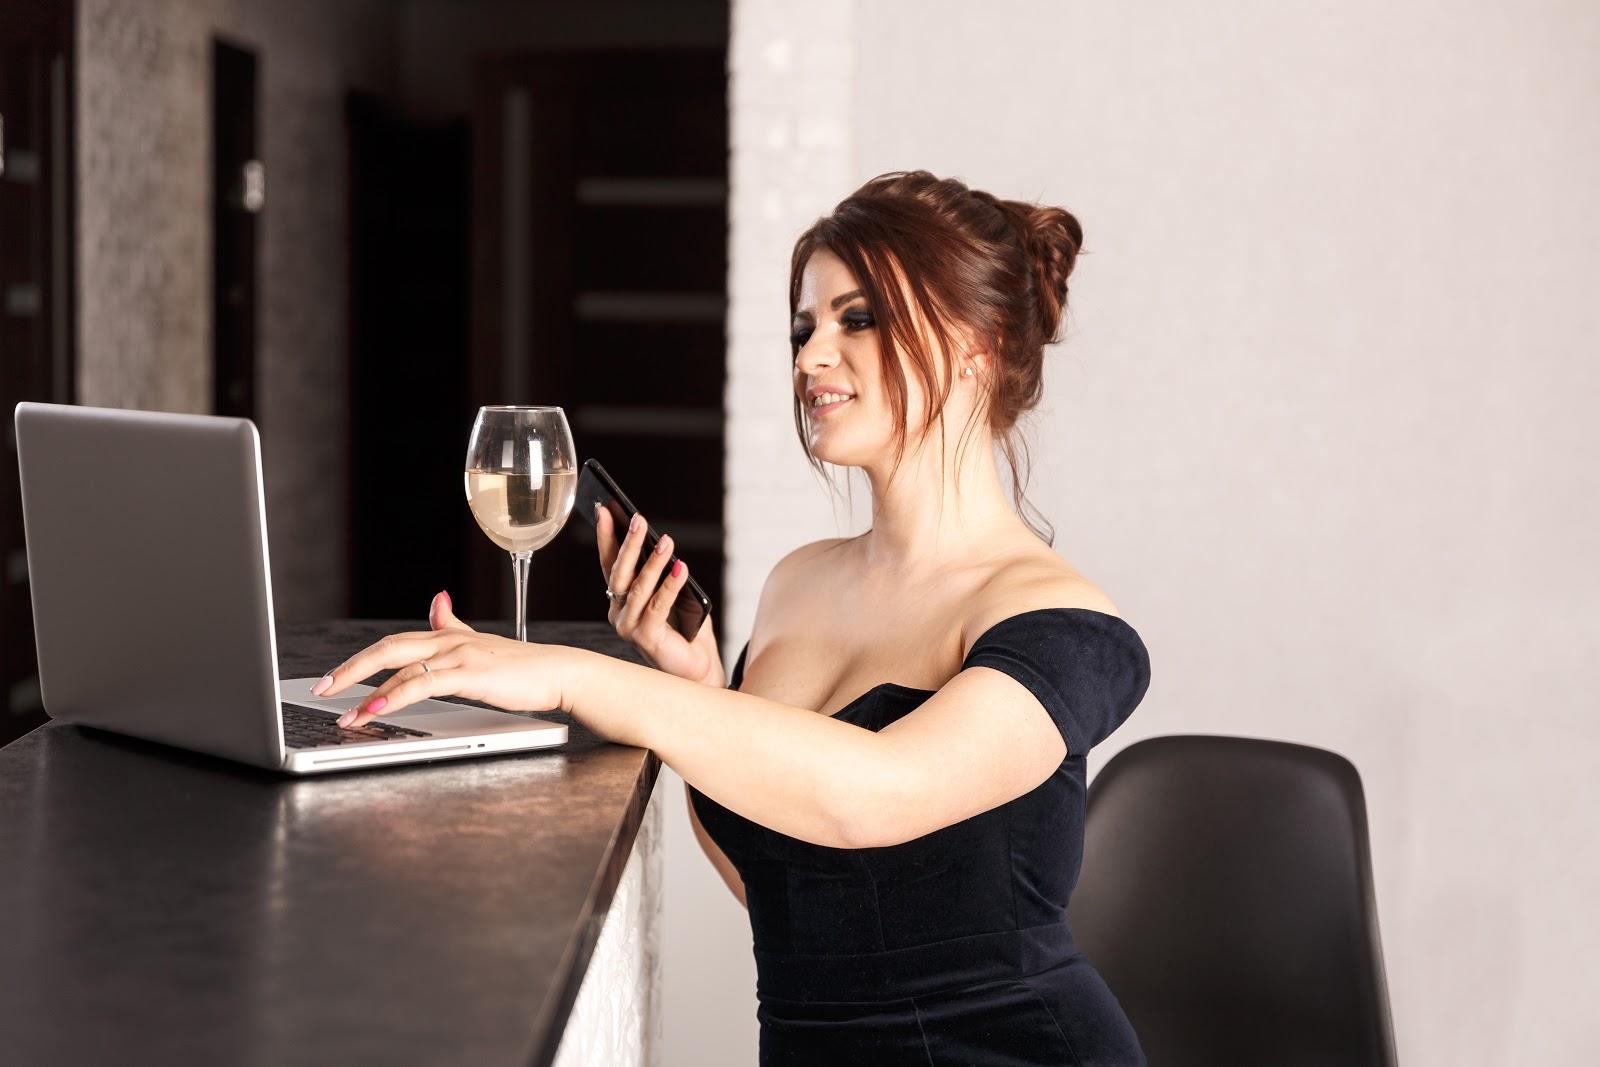 Woman in a fancy dress sitting in front of her laptop